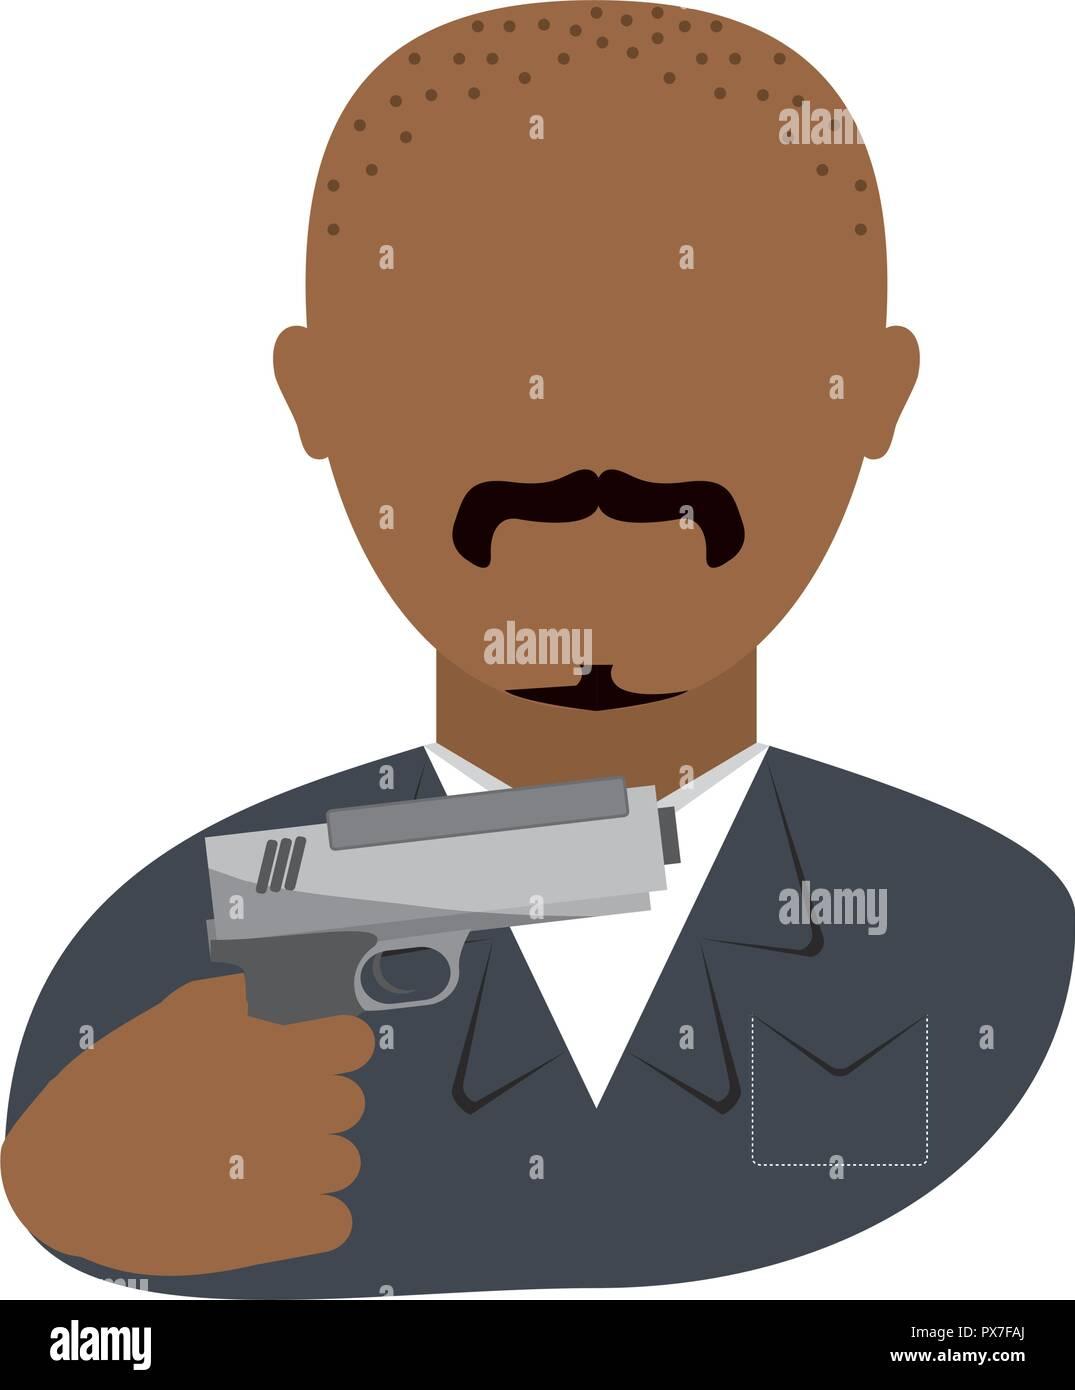 danger bandit with gun avatar character vector illustration design - Stock Image